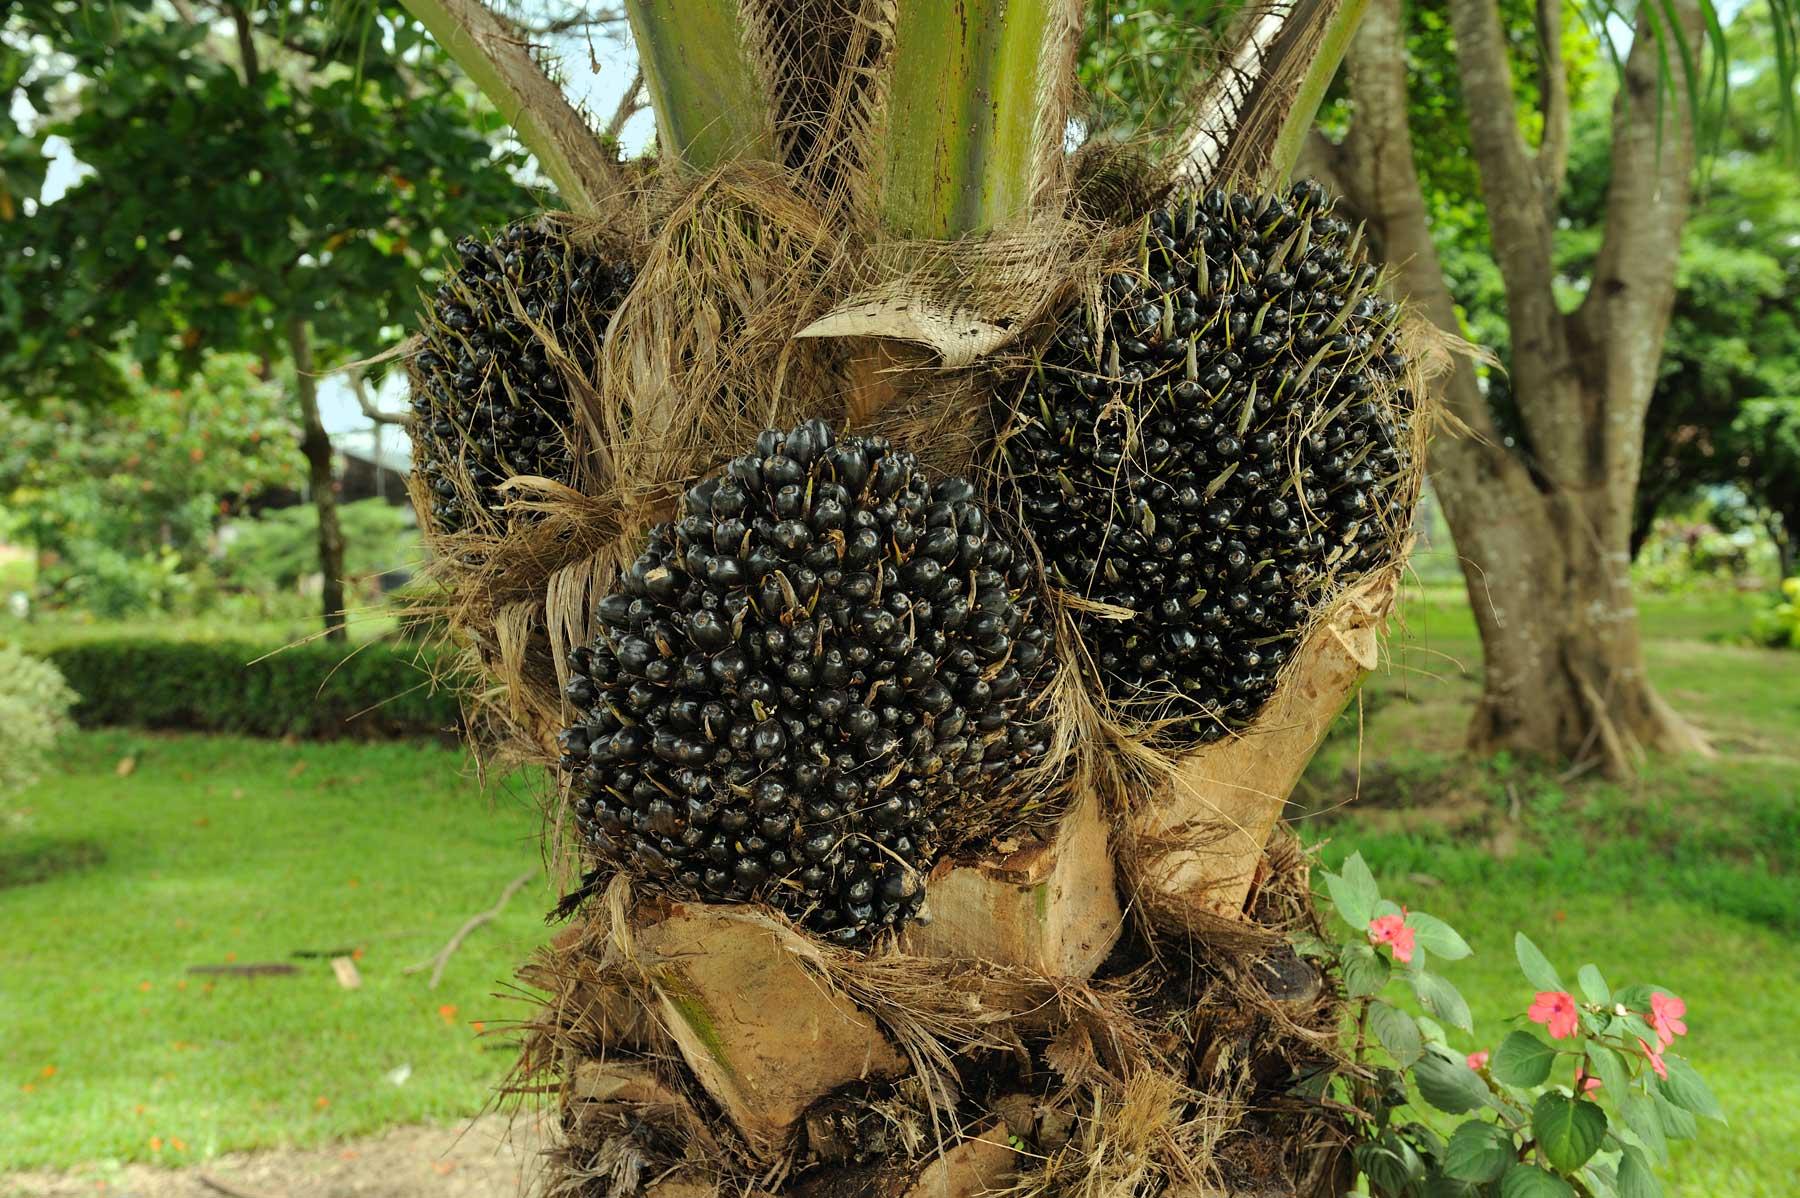 Unripe oil palm fruit clusters on tree